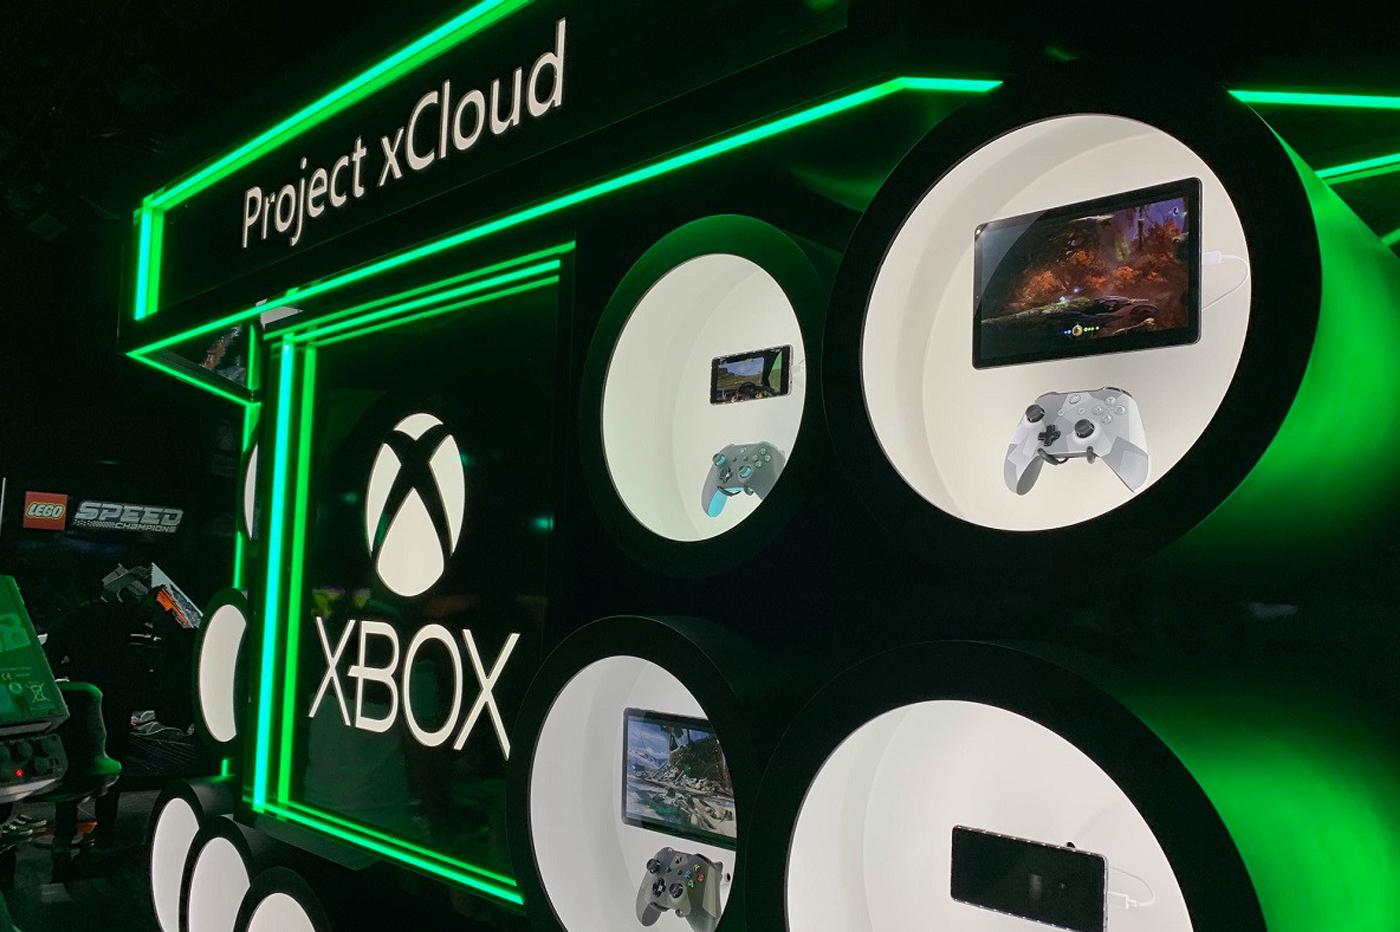 Microsoft Projet XCloud